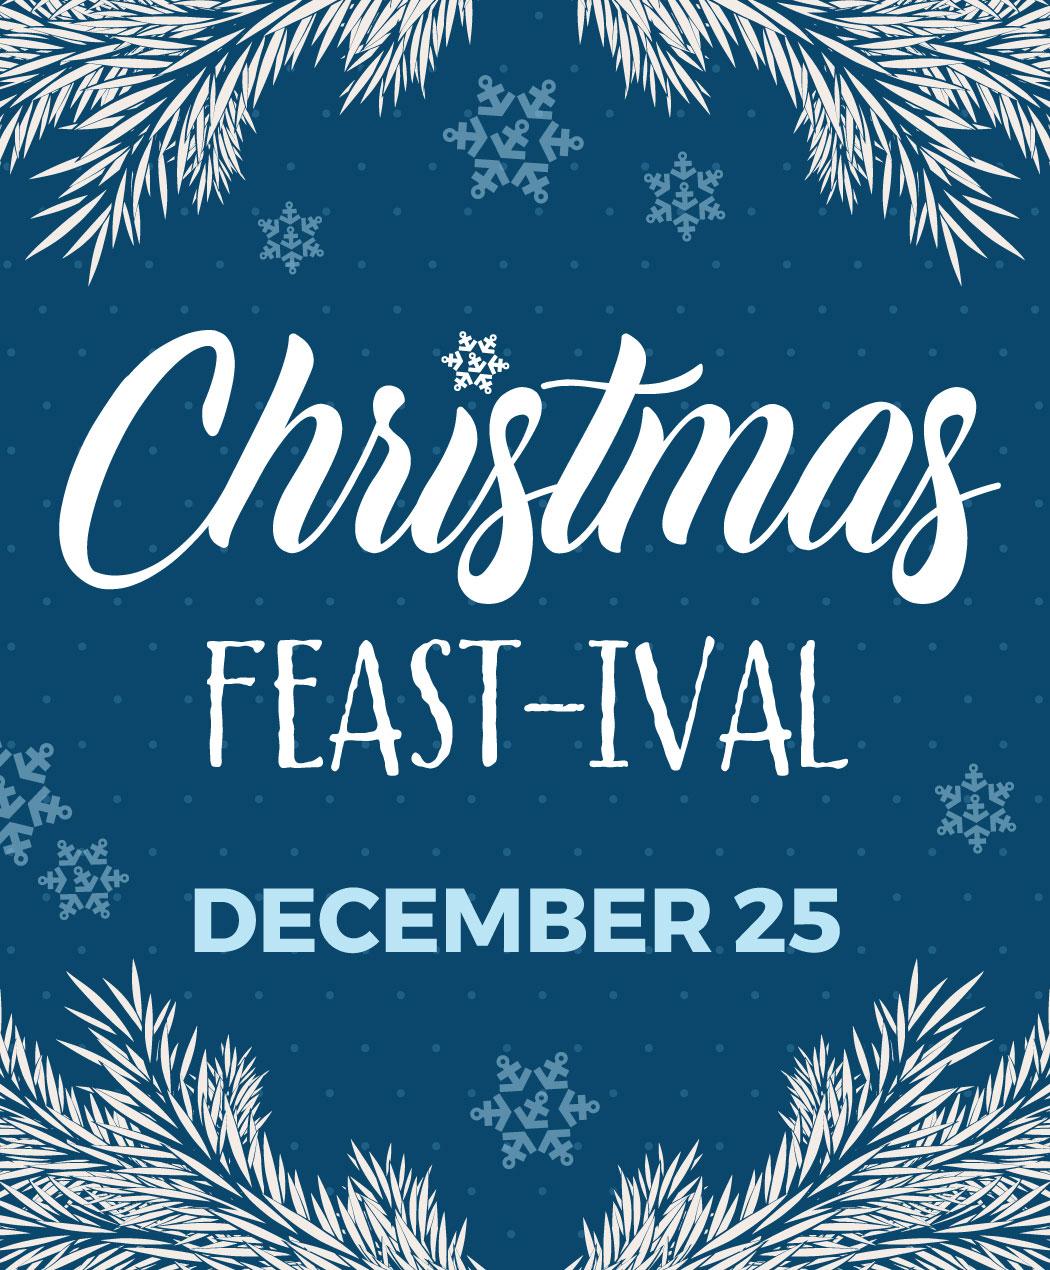 Christmas Feast-ival